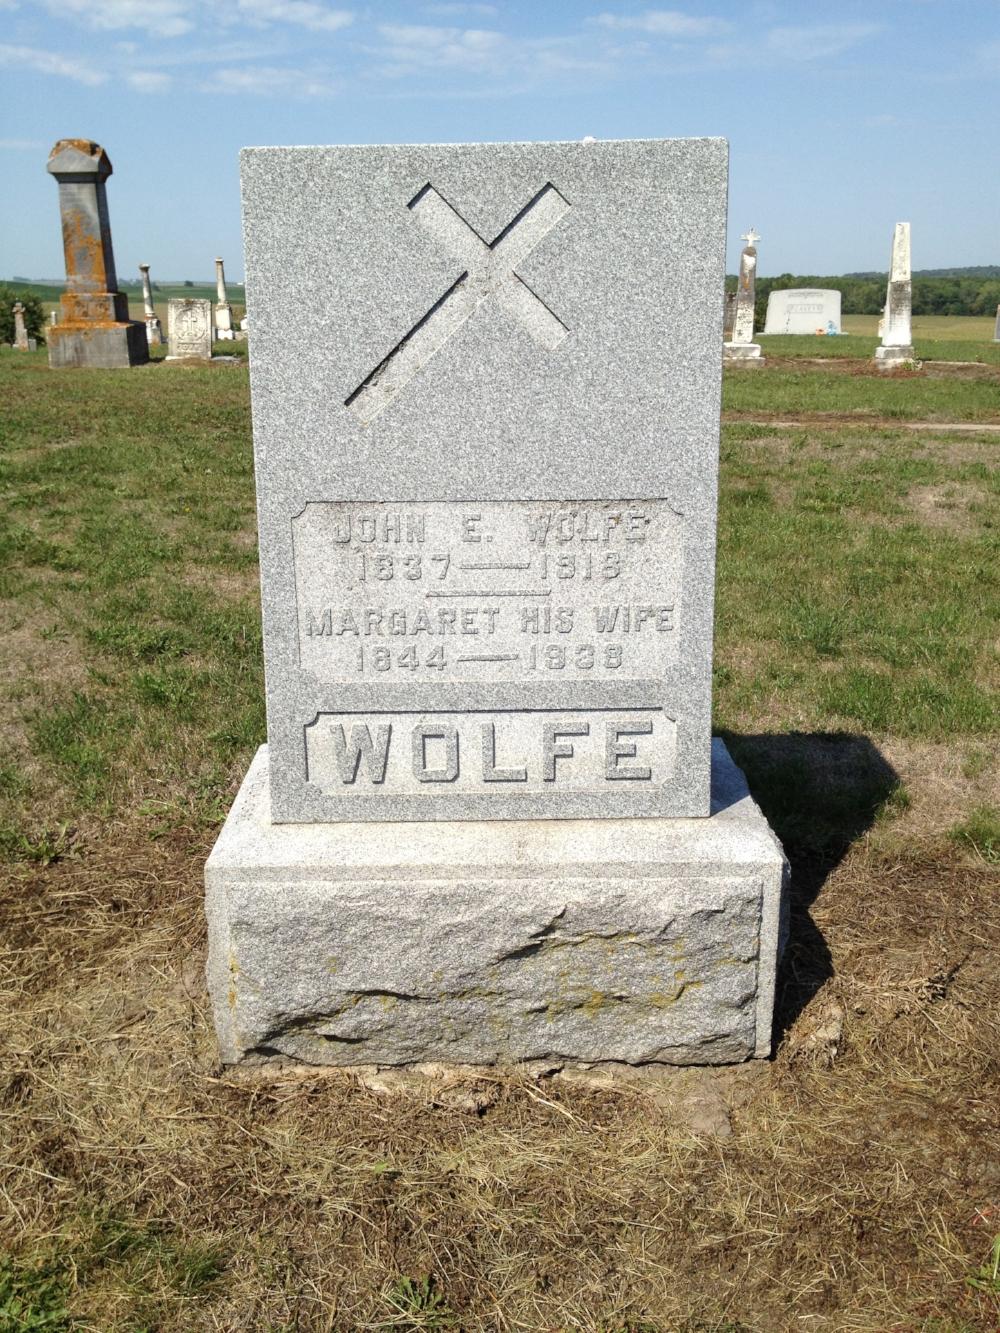 Gravestone of John E. Wolfe, Saint James Cemetery, Toronto, Iowa